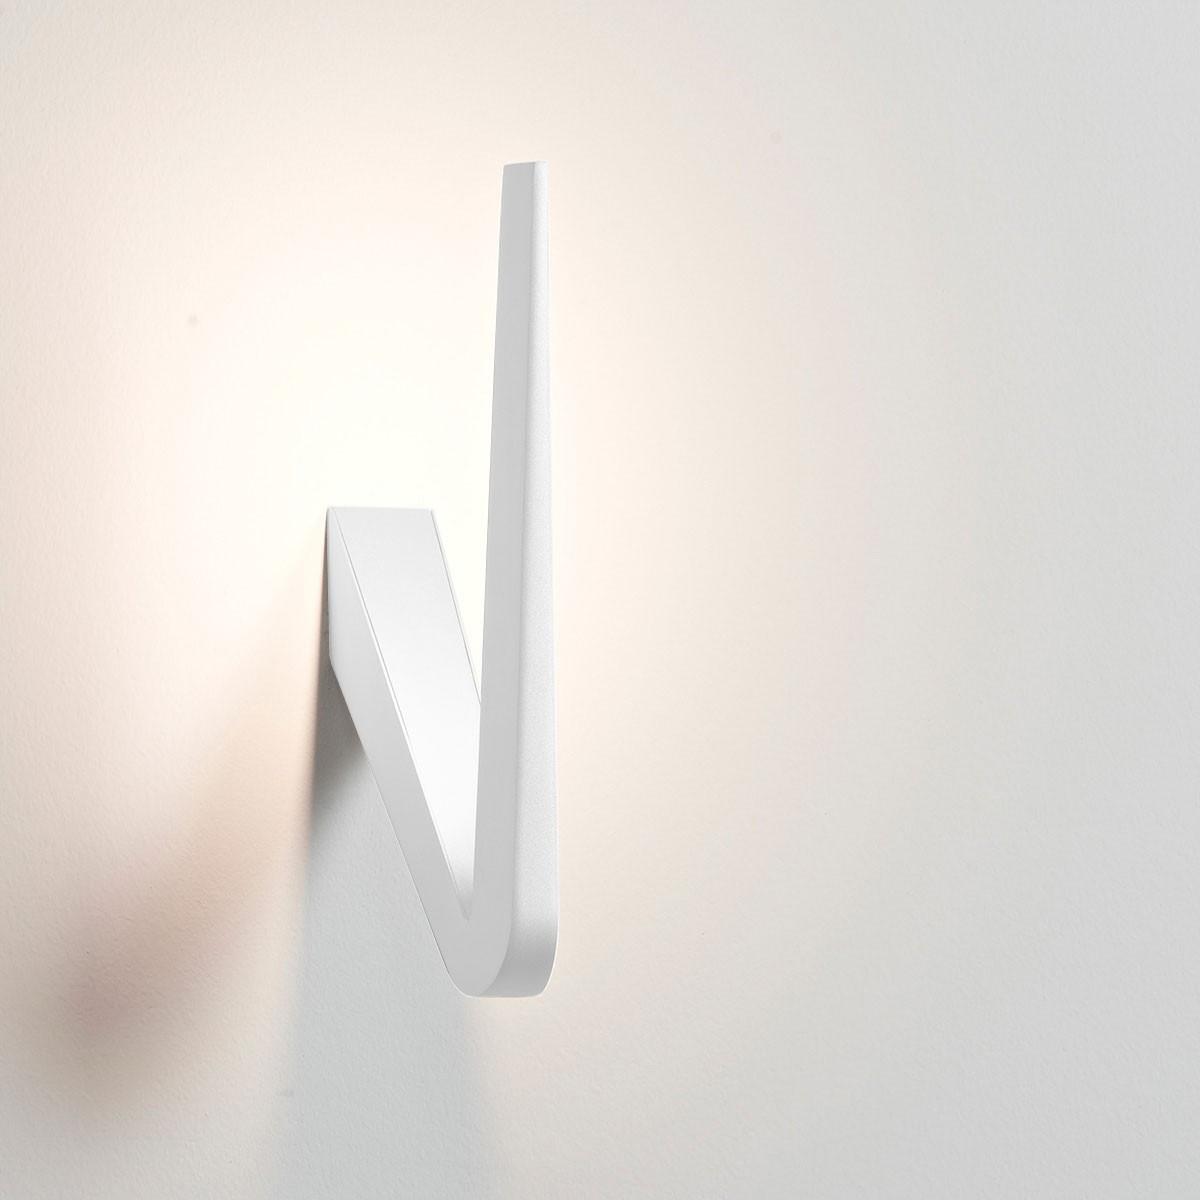 Rotaliana Tick W0 Wand- / Deckenleuchte, weiß matt